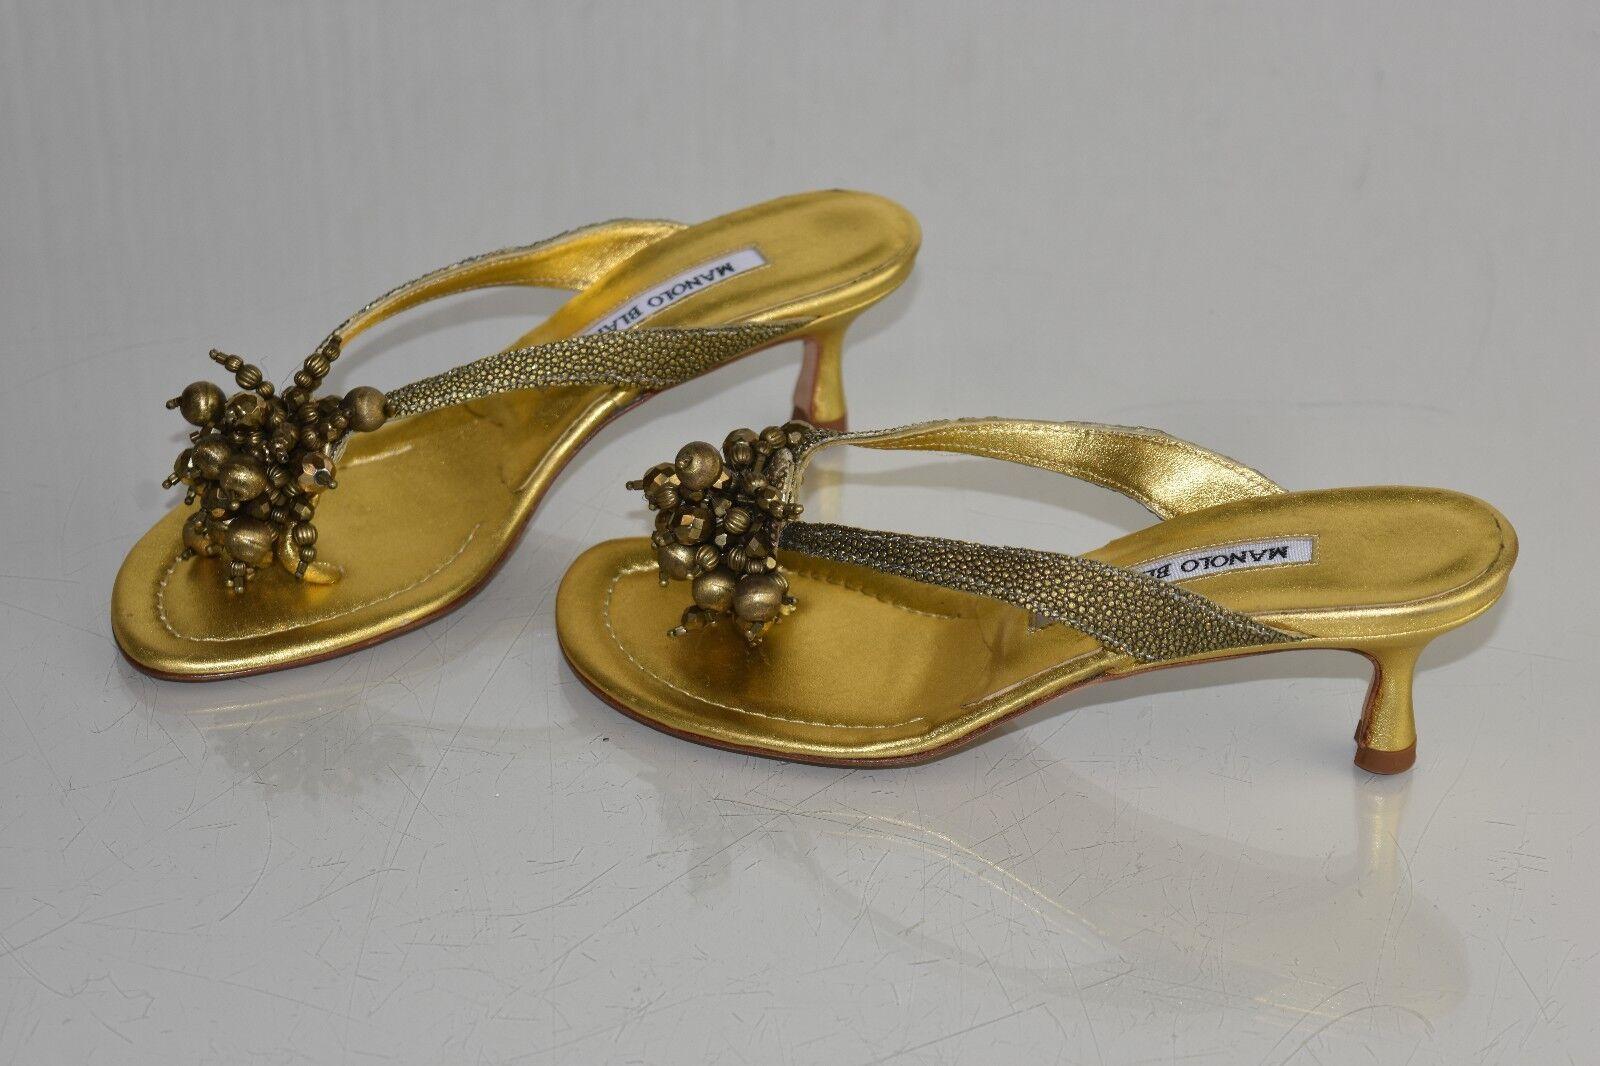 735 New Manolo Blahnik Blahnik Blahnik Jewel Thong SANDALS Slides Gold Kitten schuhe 35.5 40.5 b00938